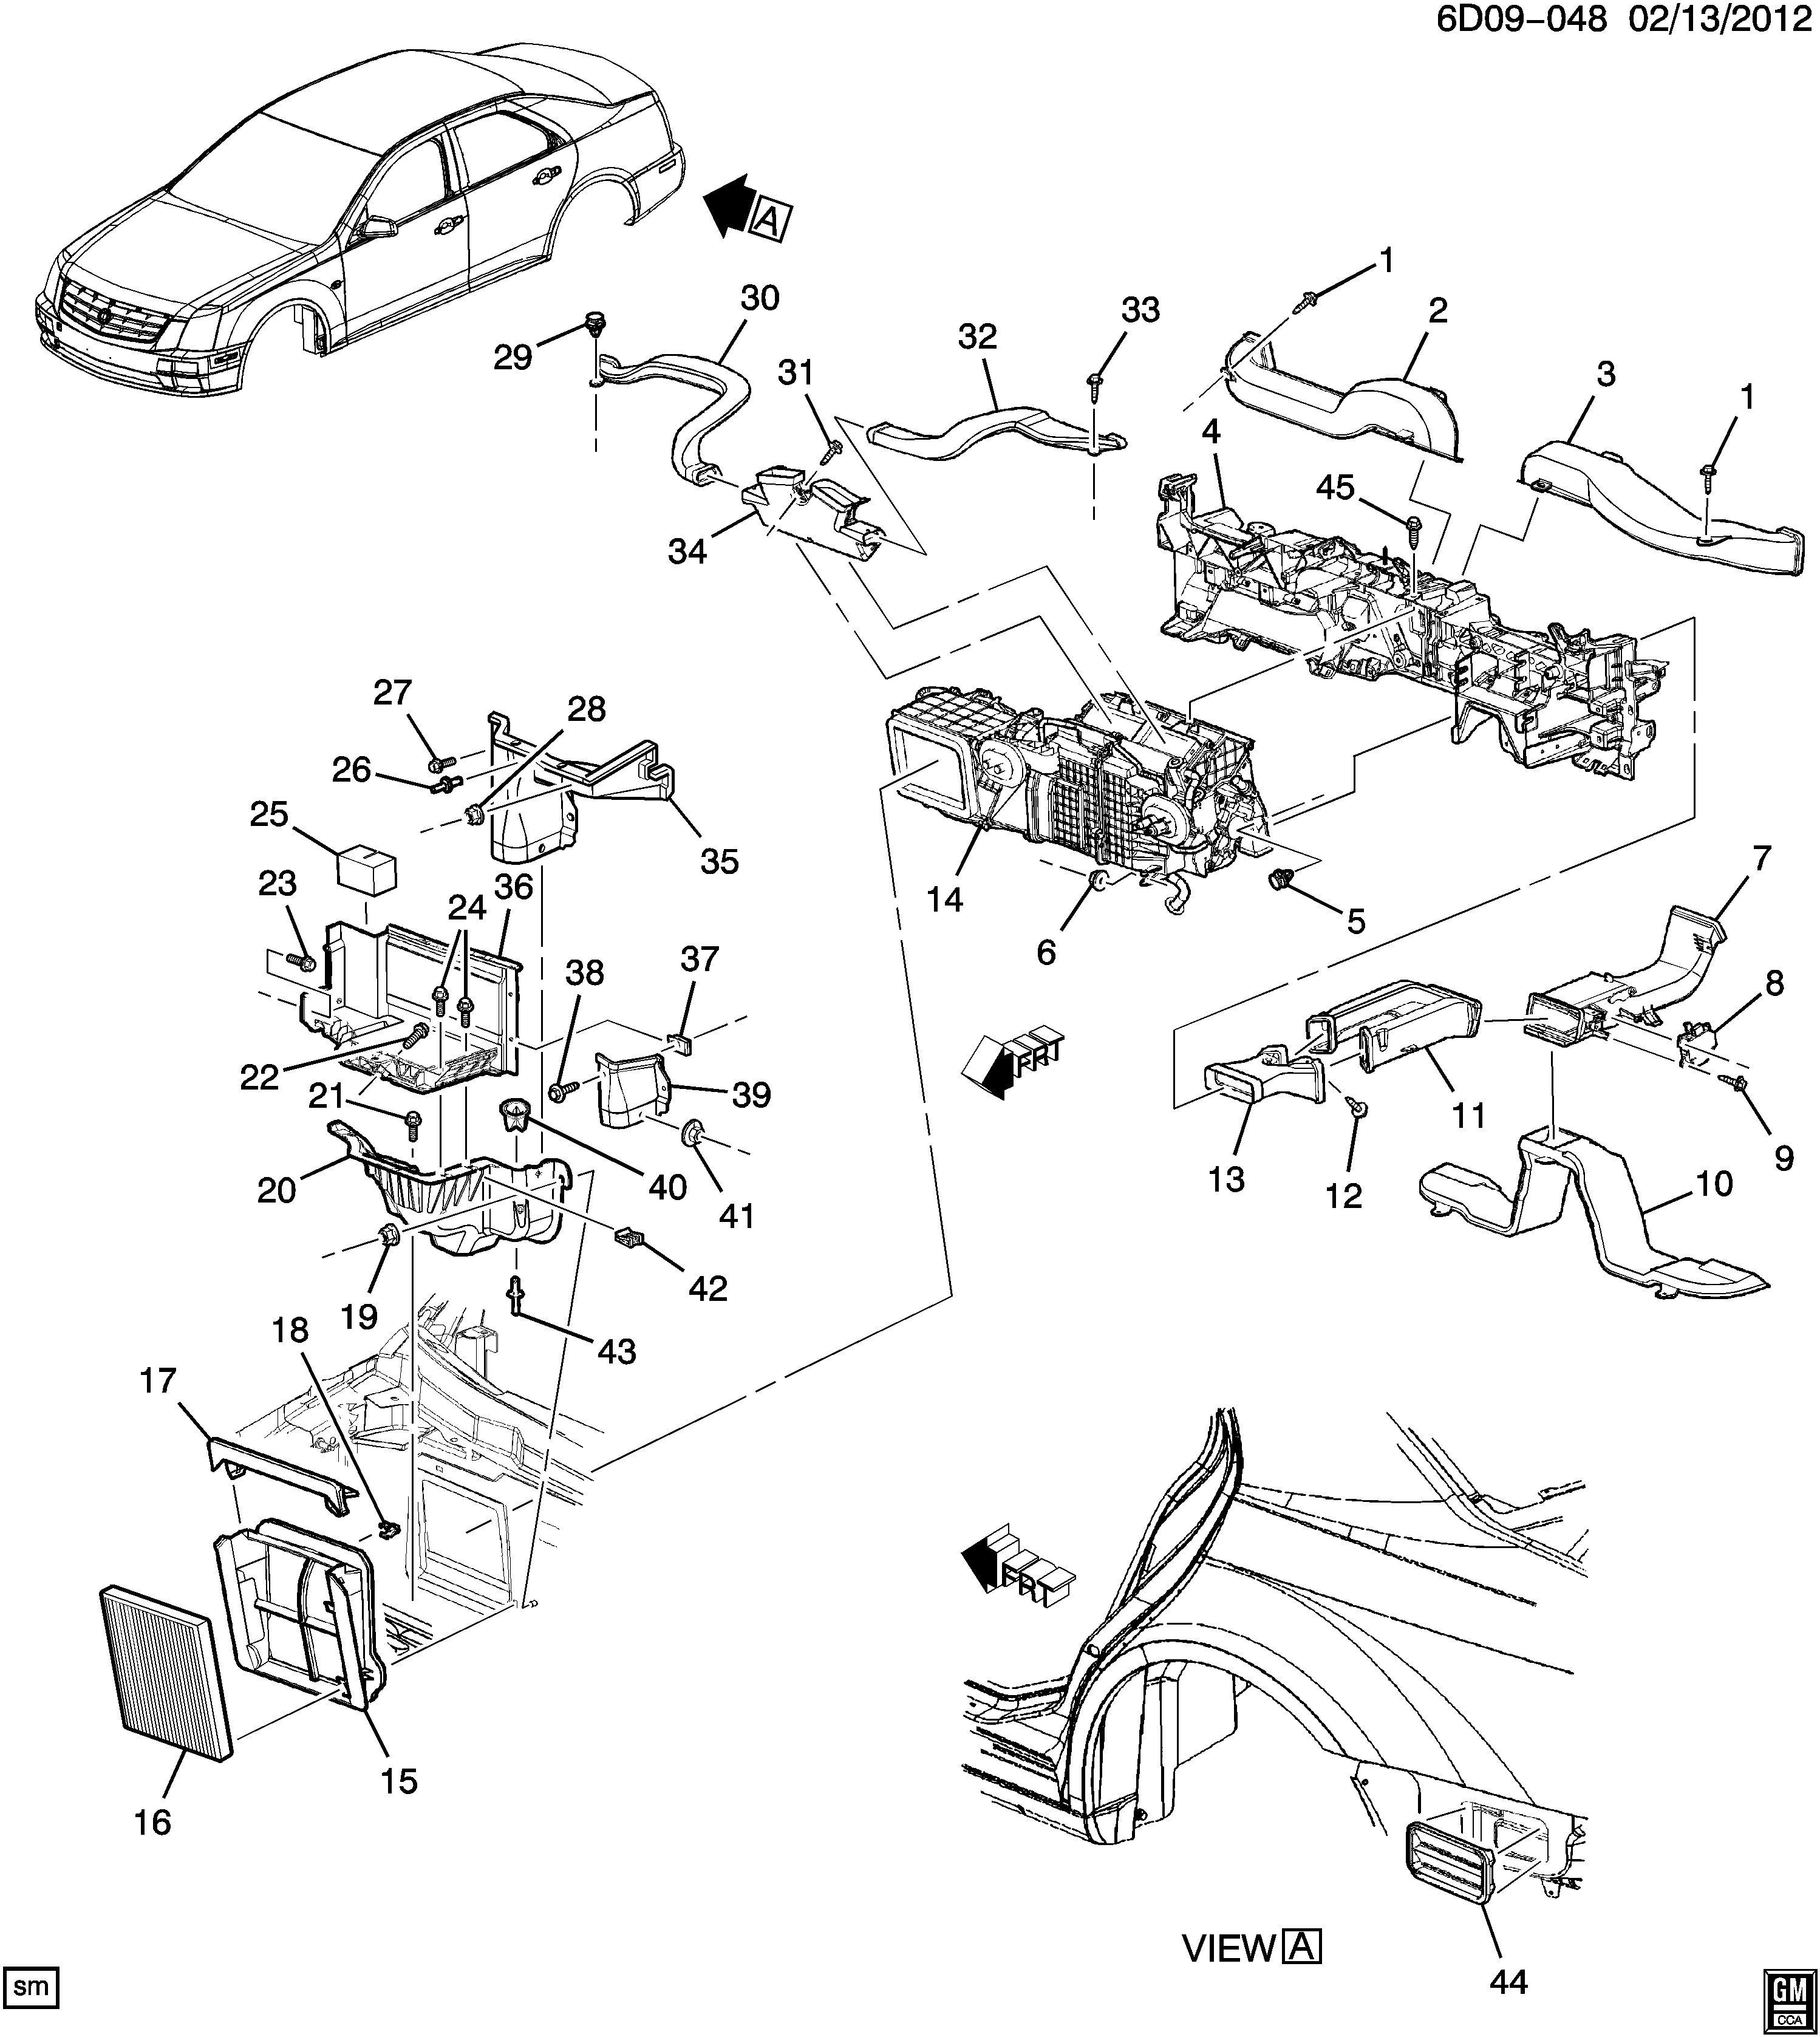 Cadillac Sts Duct Air Distributor Duct Flr Rr Air Otlt